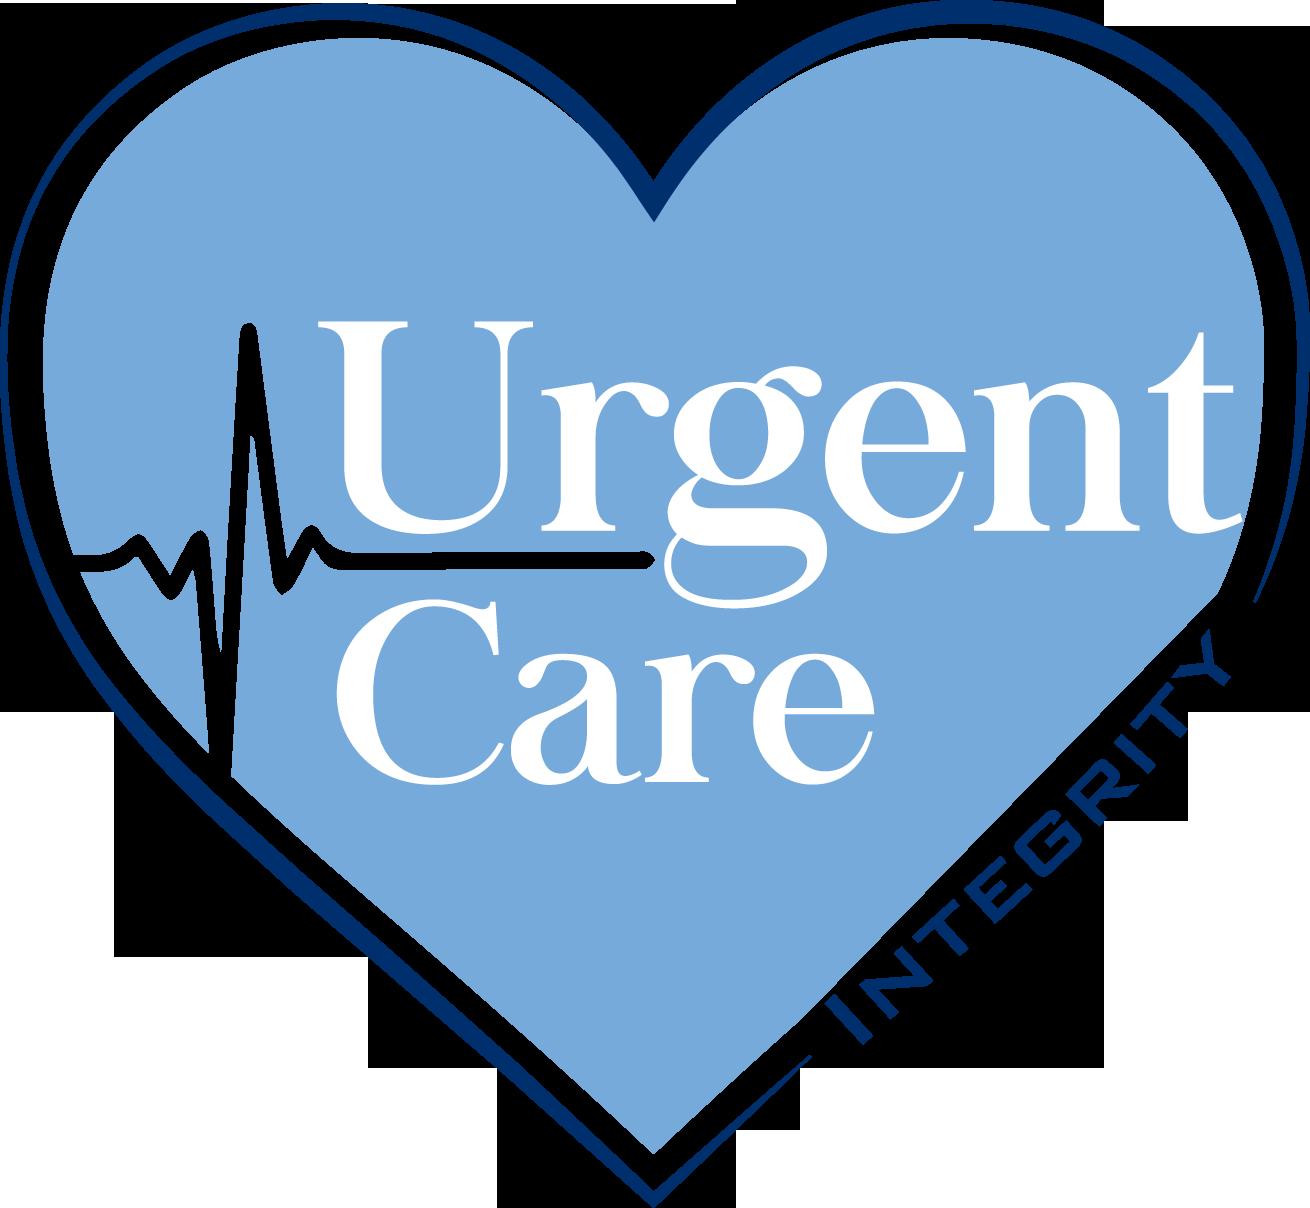 Integrity Urgent Care - Corsicana Logo